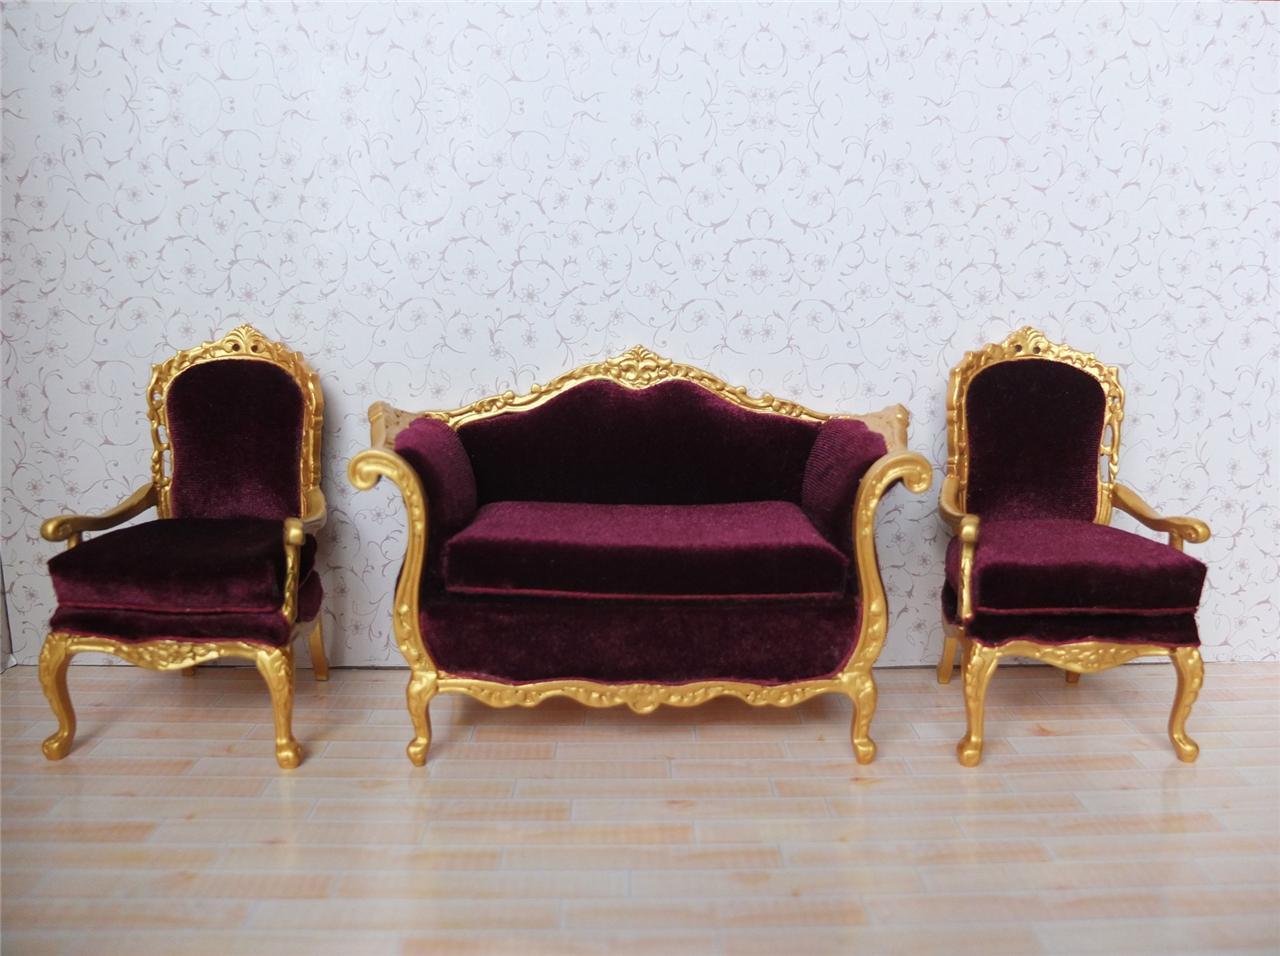 miniature sofa jack knife mechanism bespaq dollhouse living room furniture set